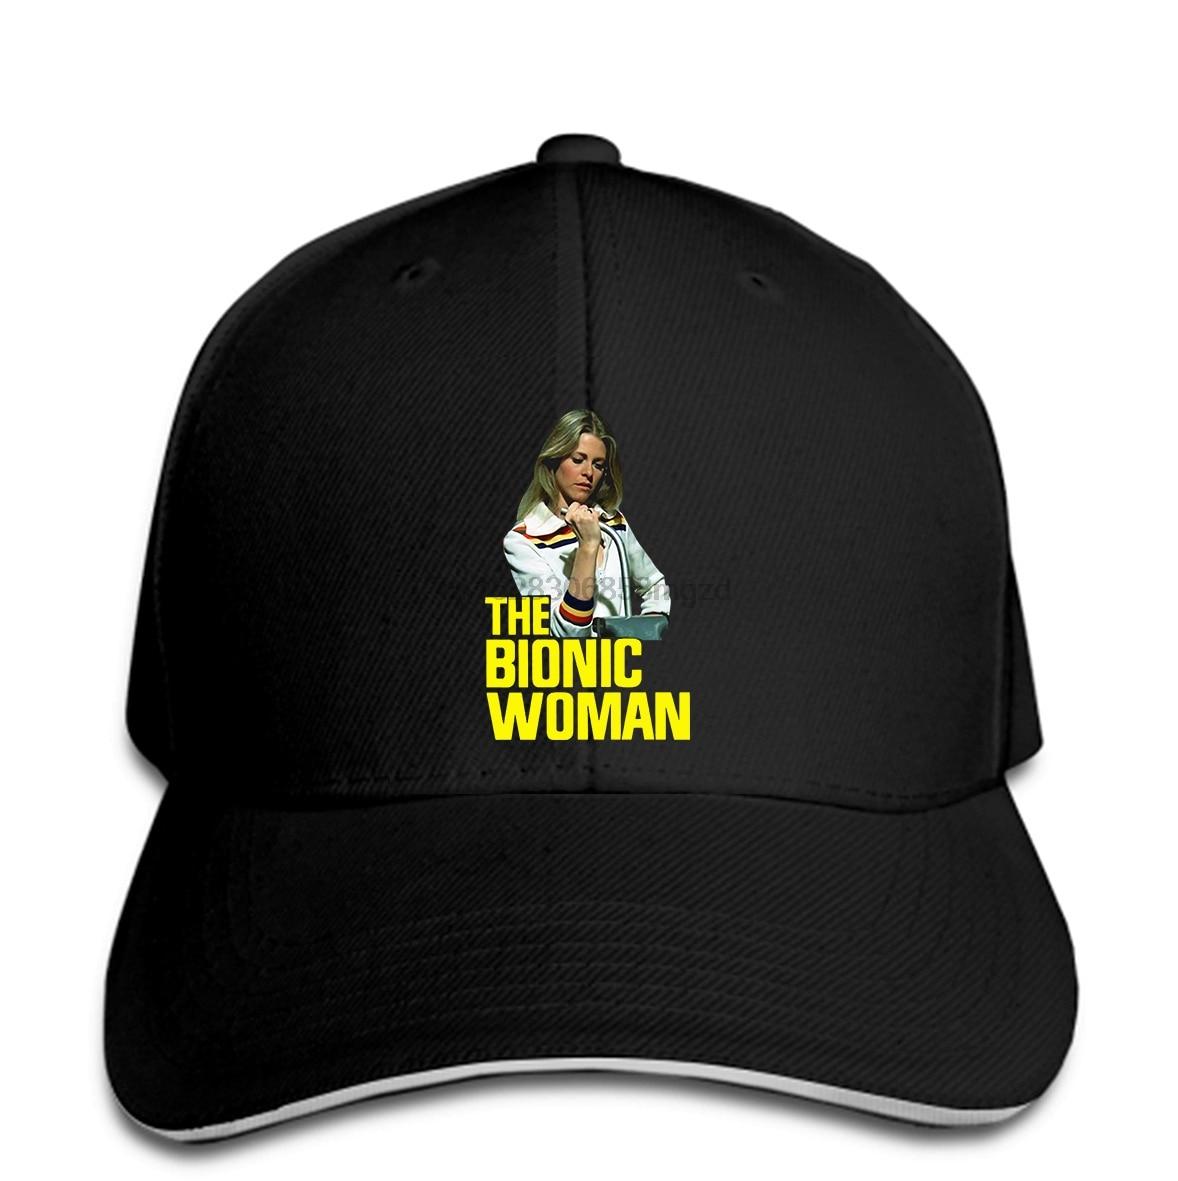 Moda divertida s La mujer biónica gorra de béisbol para hombres con estampado gorra de béisbol para hombres gorras de béisbol para hombre ropa de calle gorra de Snapback